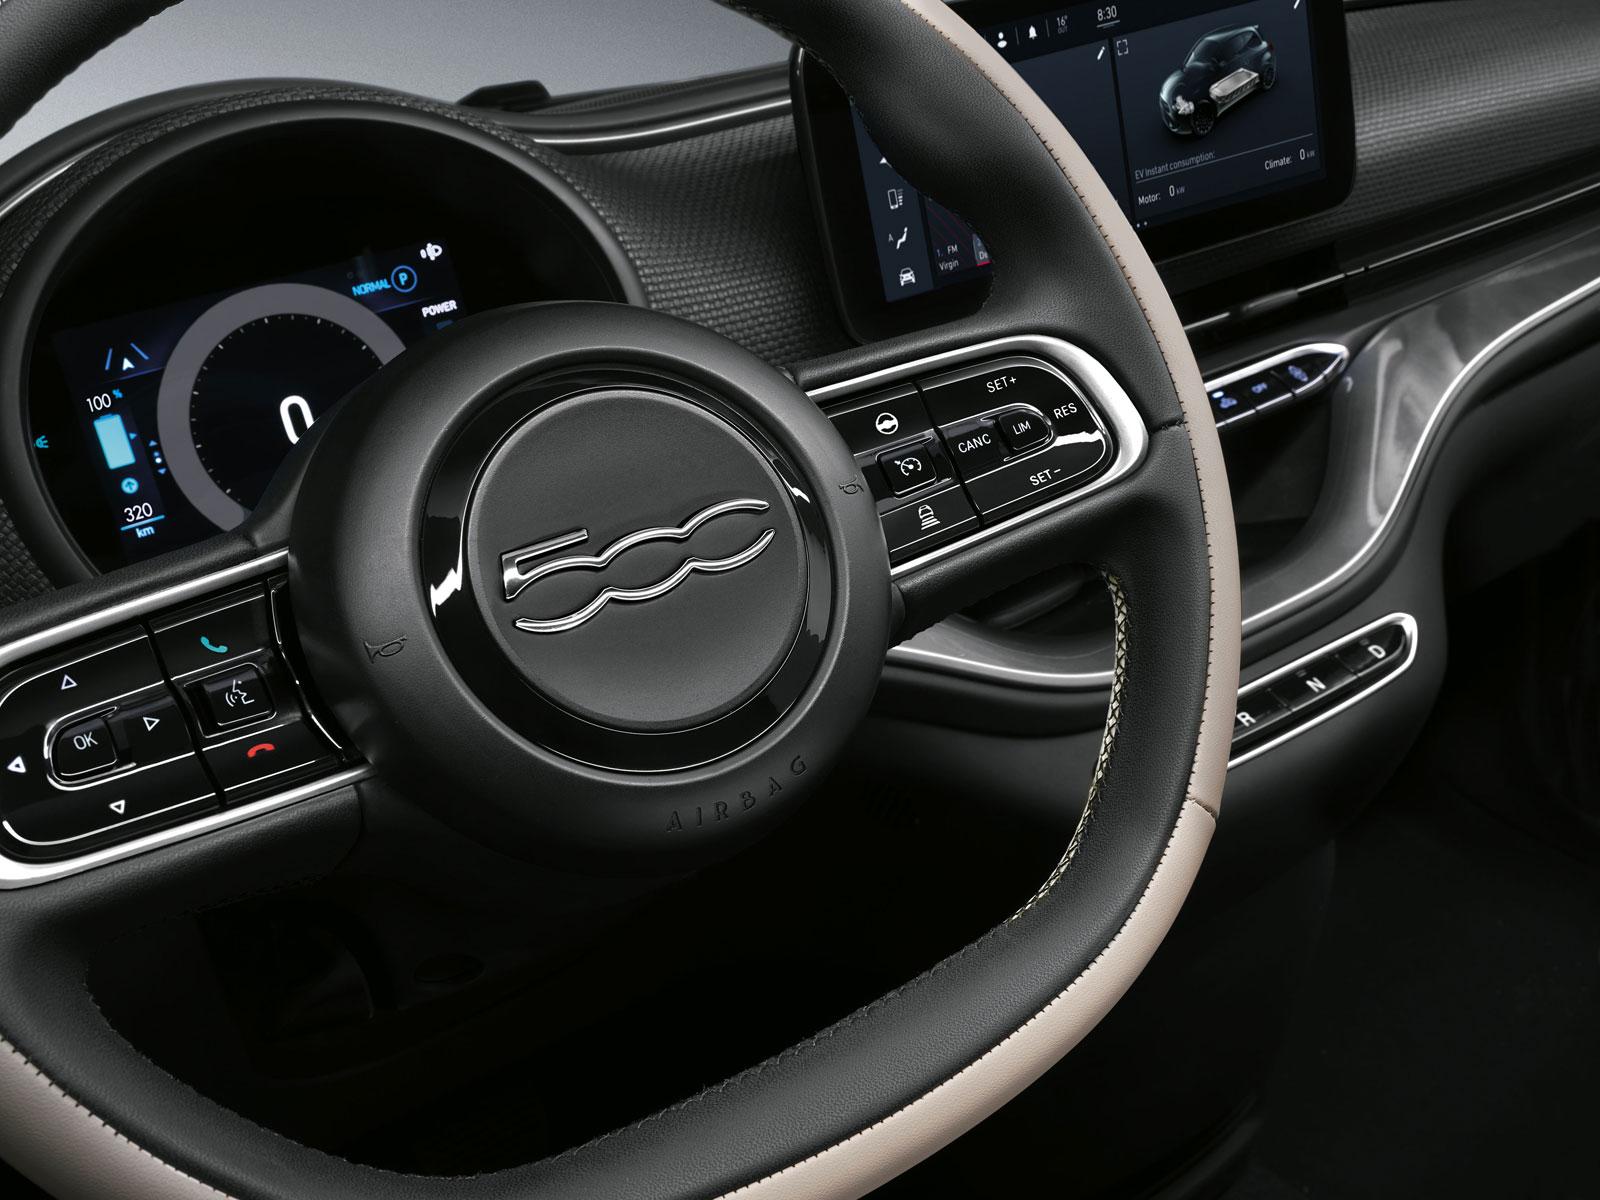 Spiksplinternieuw New Fiat 500 Interior Design - Car Body Design XC-92